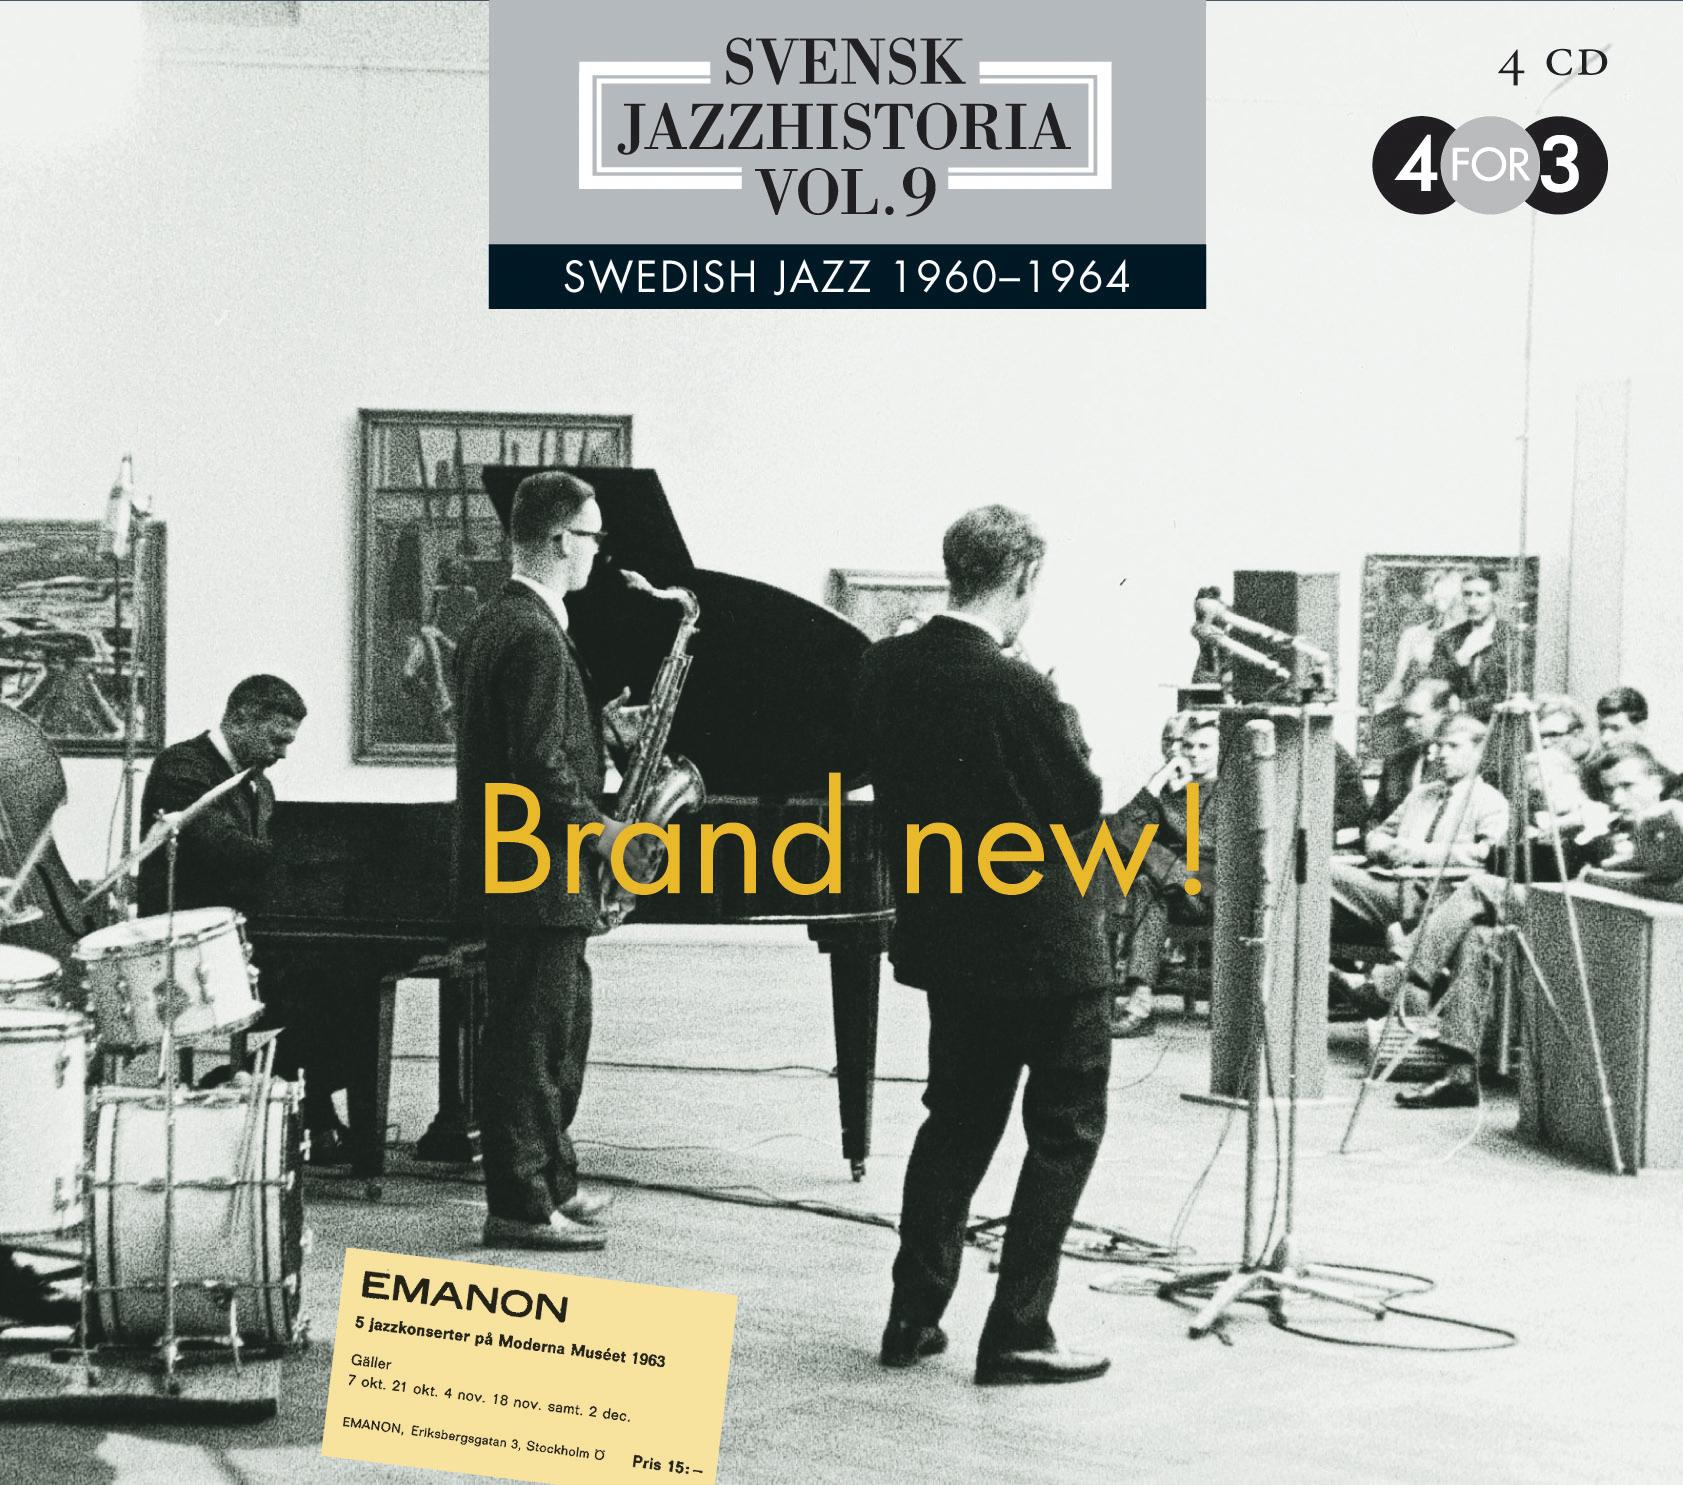 Brand new! vol. 9, 1960-64